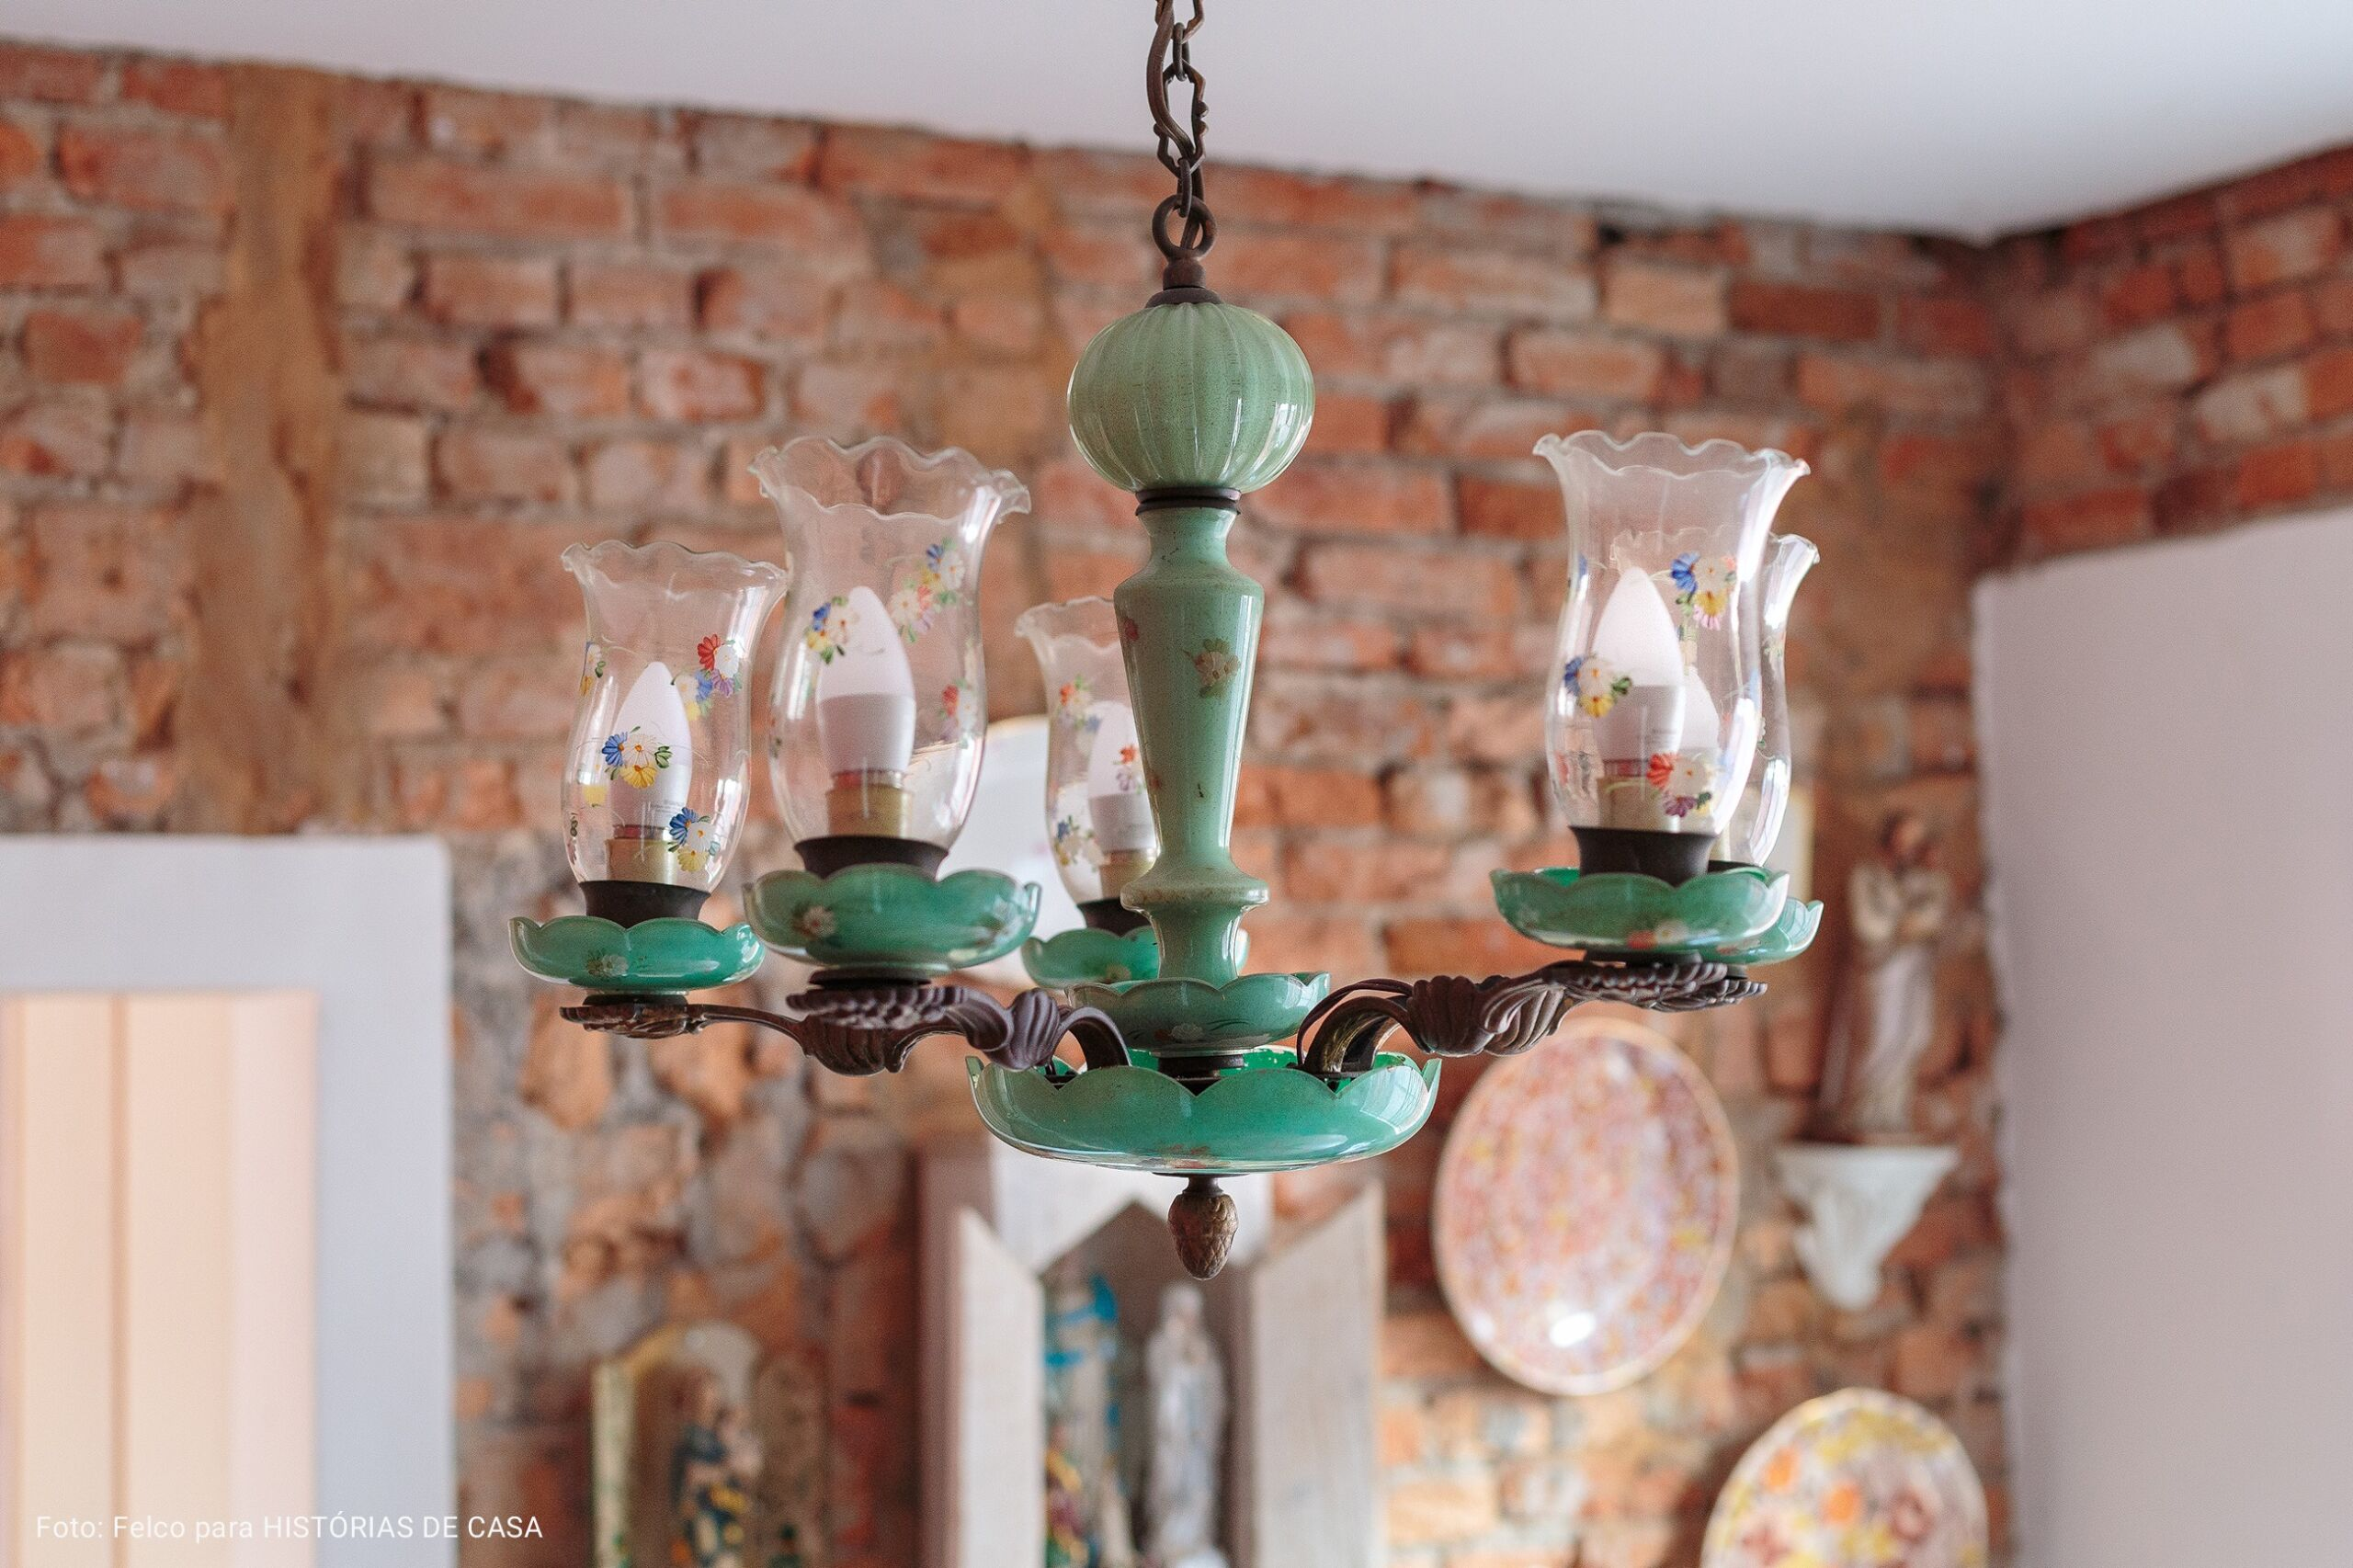 sala de jantar com lustre vintage